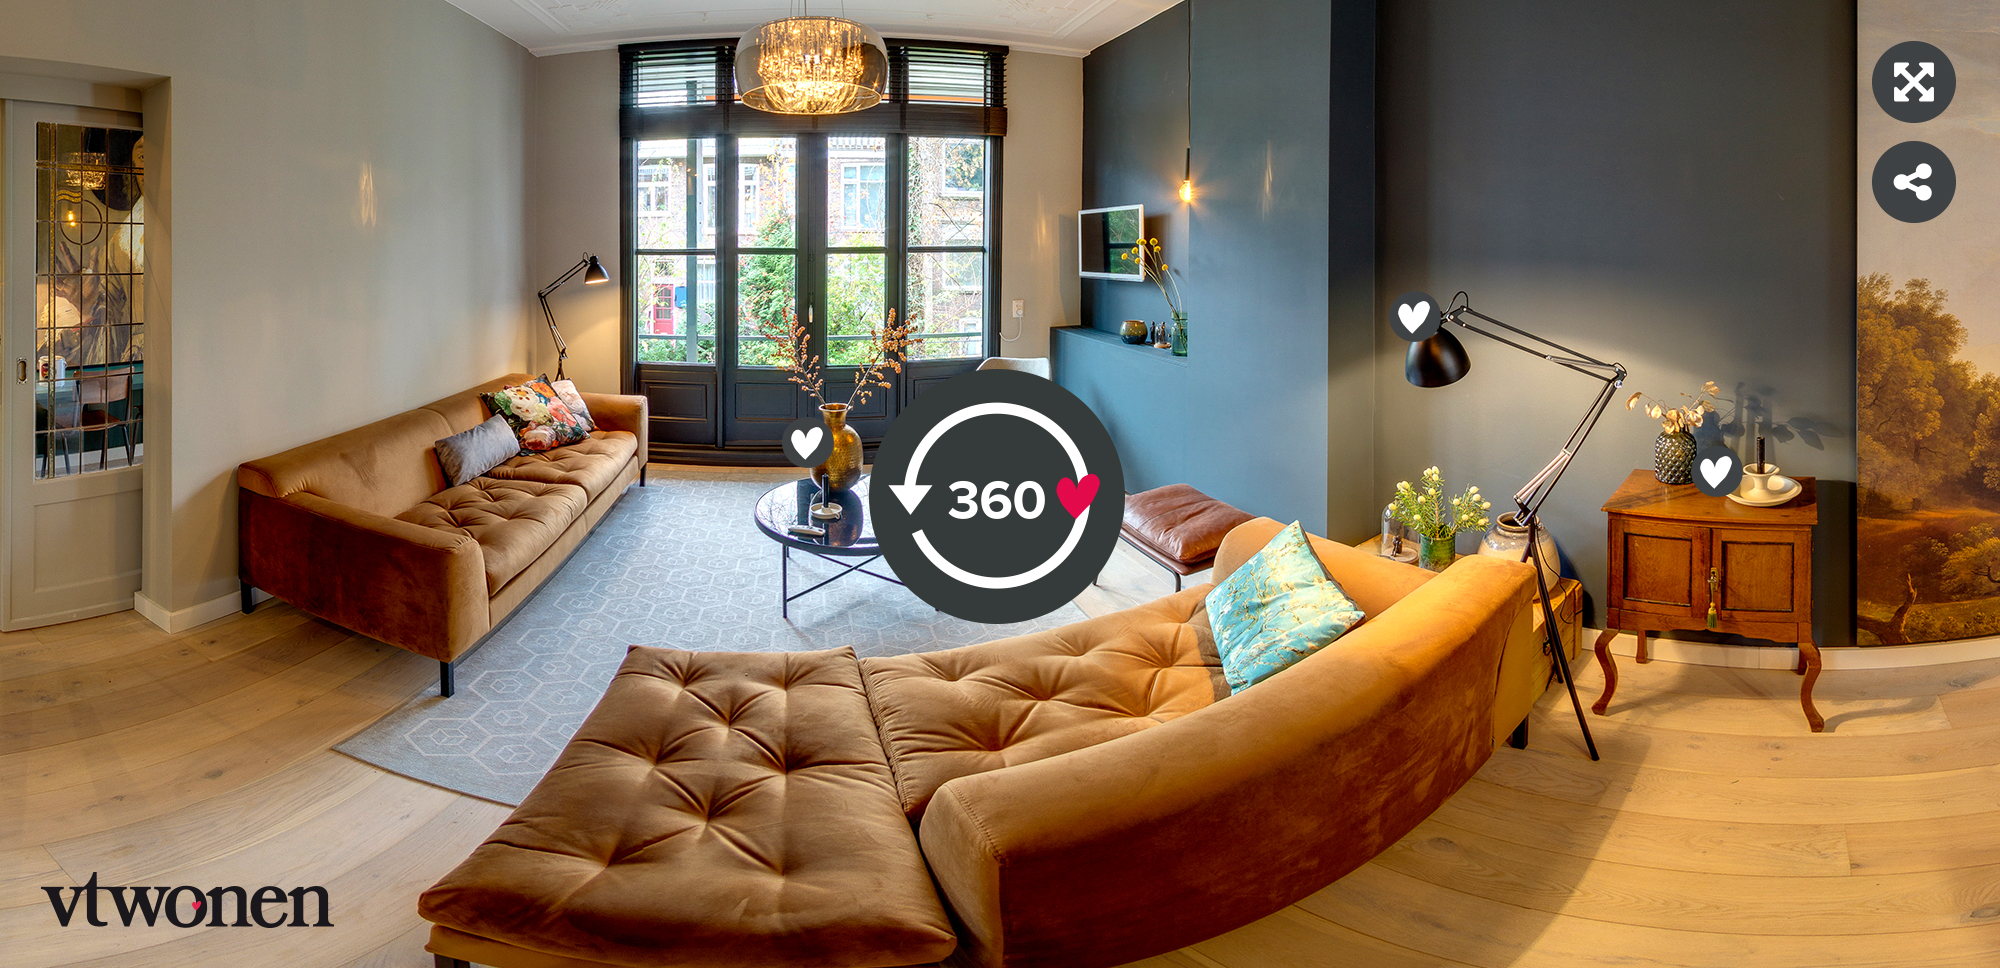 vtwonen verhuist seizoen 1 aflevering 4 - Stylist Frans Uyterlinde - 360 tour